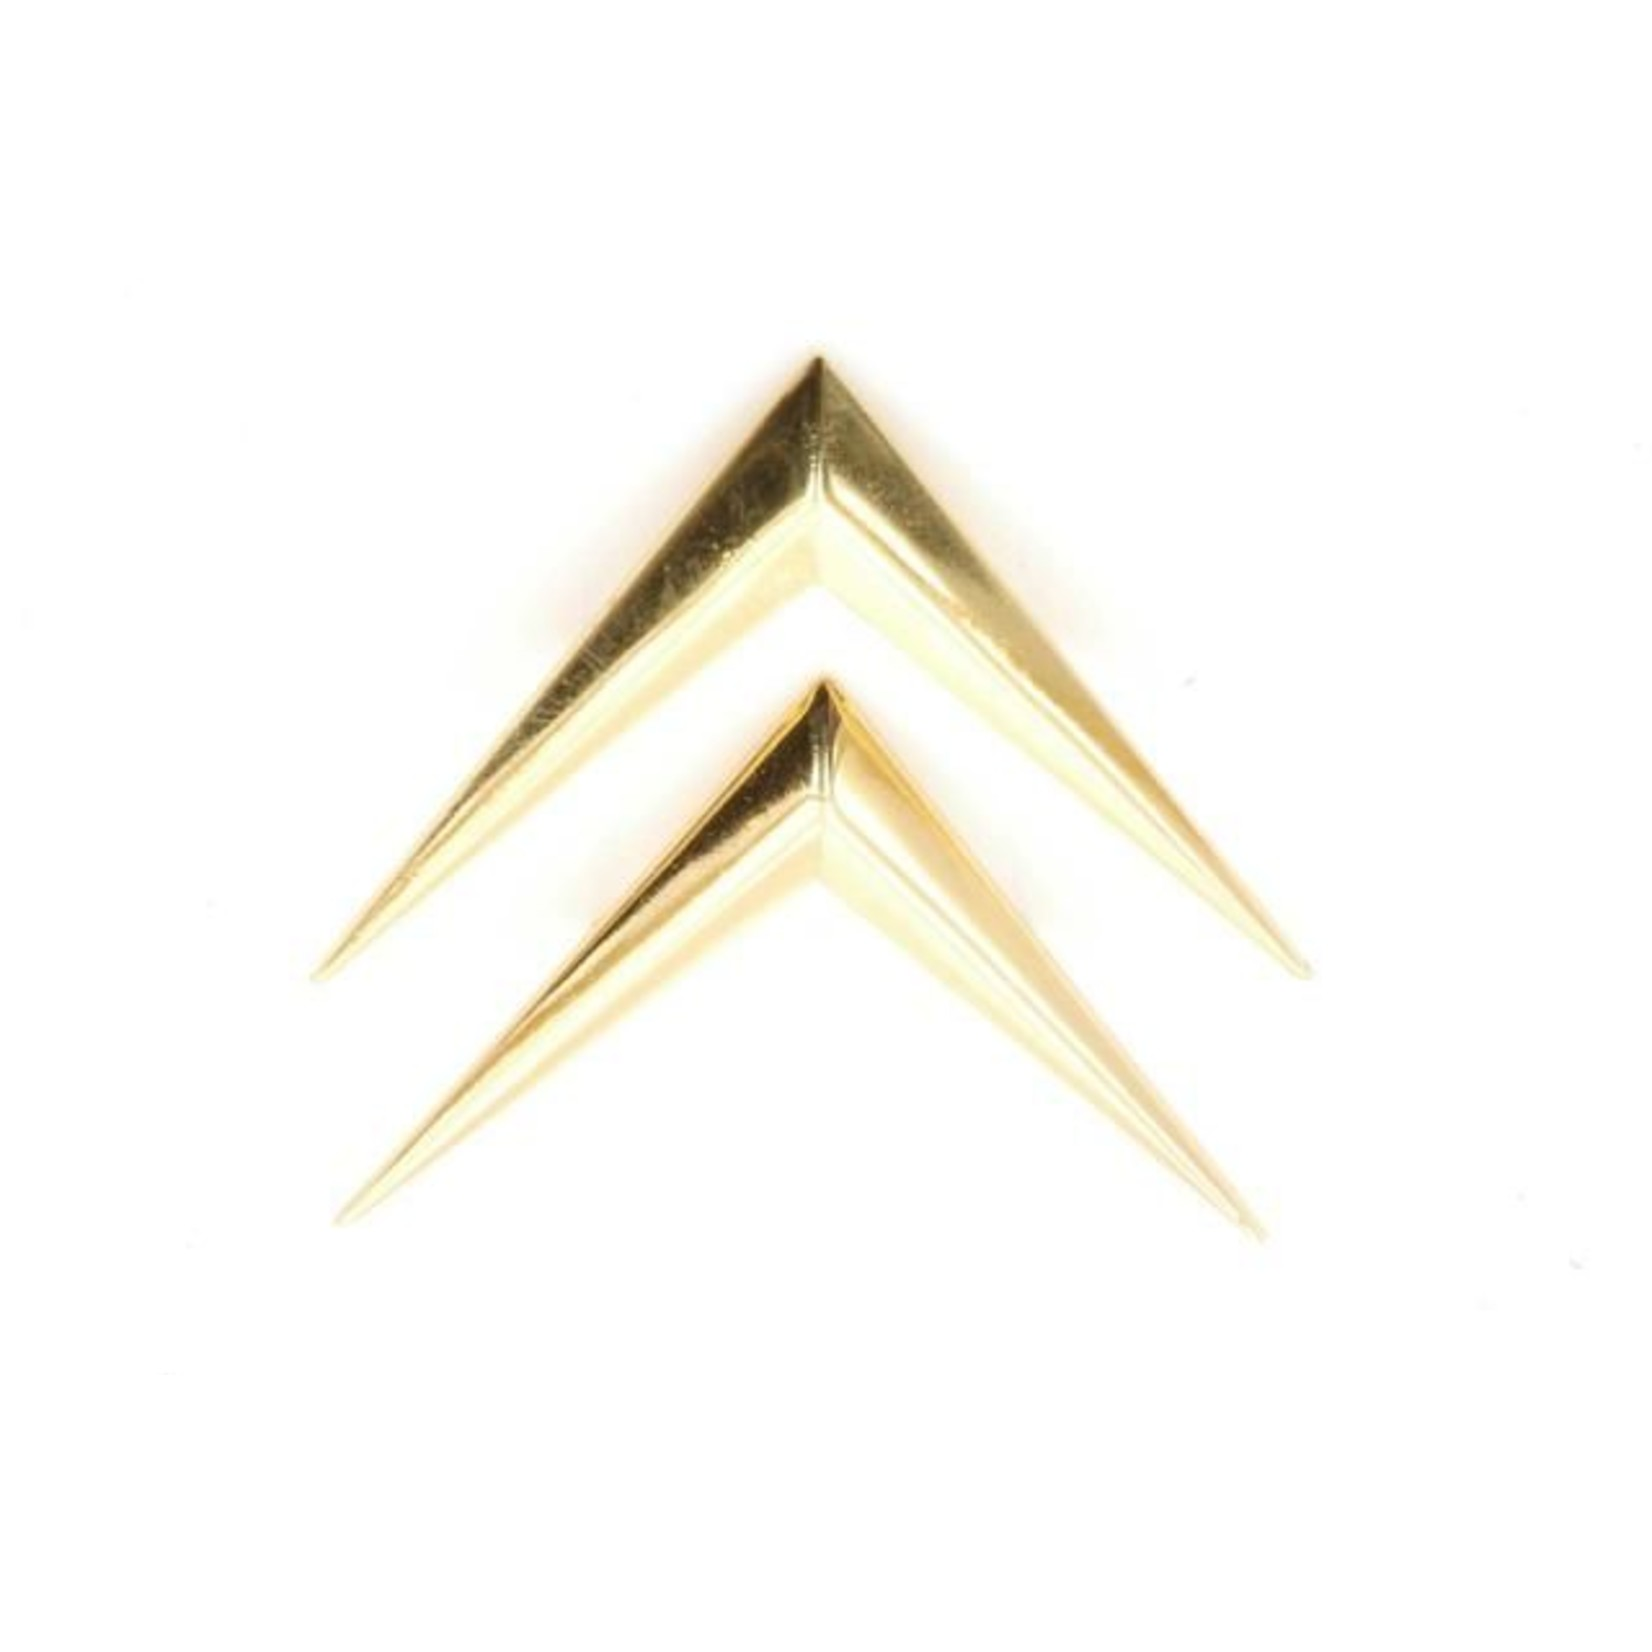 Cheuron dorado Nr Org: D8544